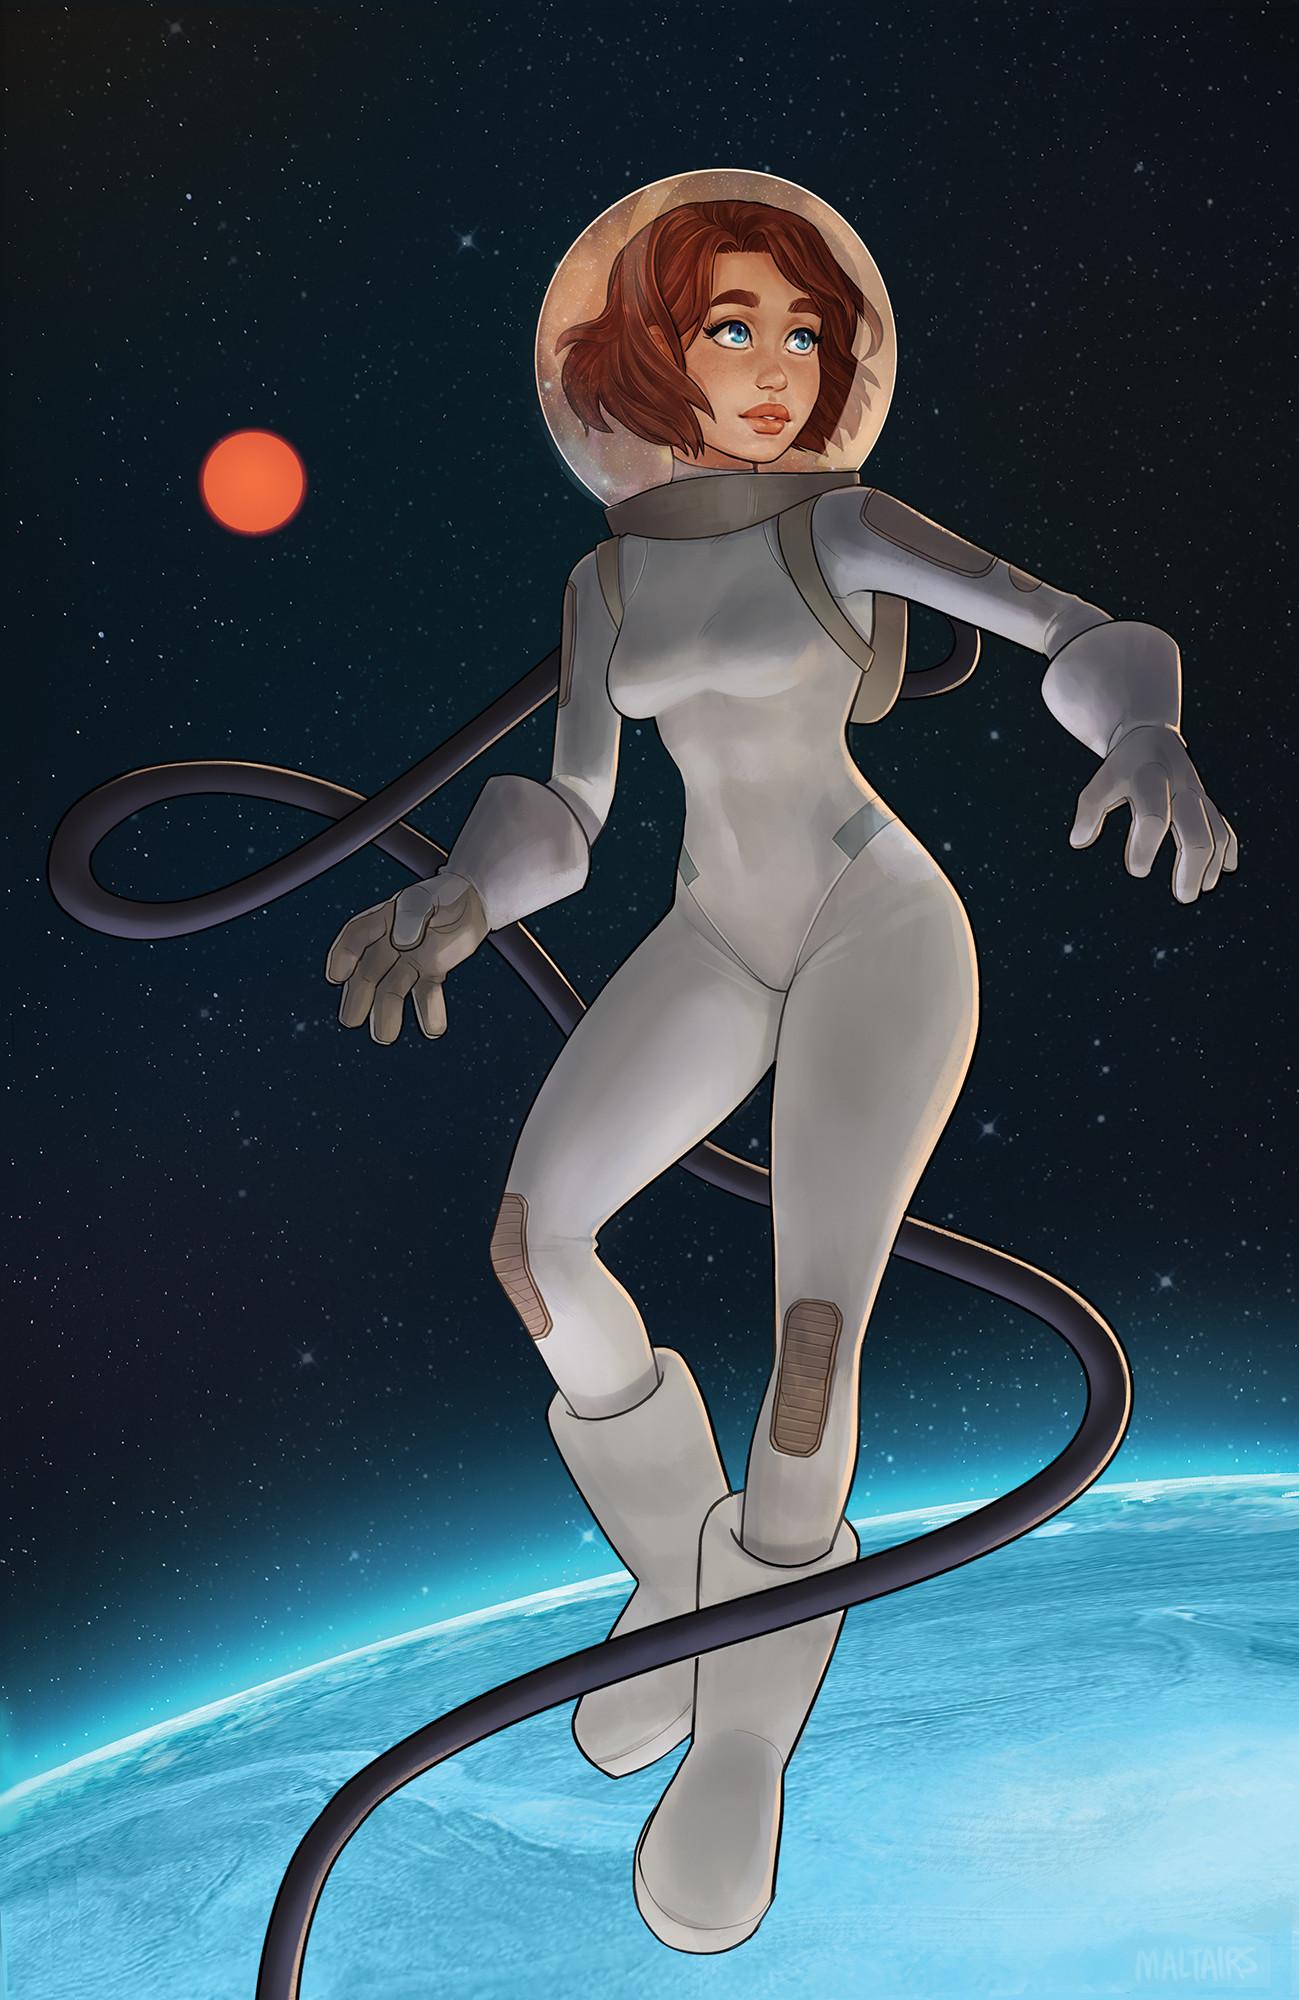 Alice hamel astronaut 5